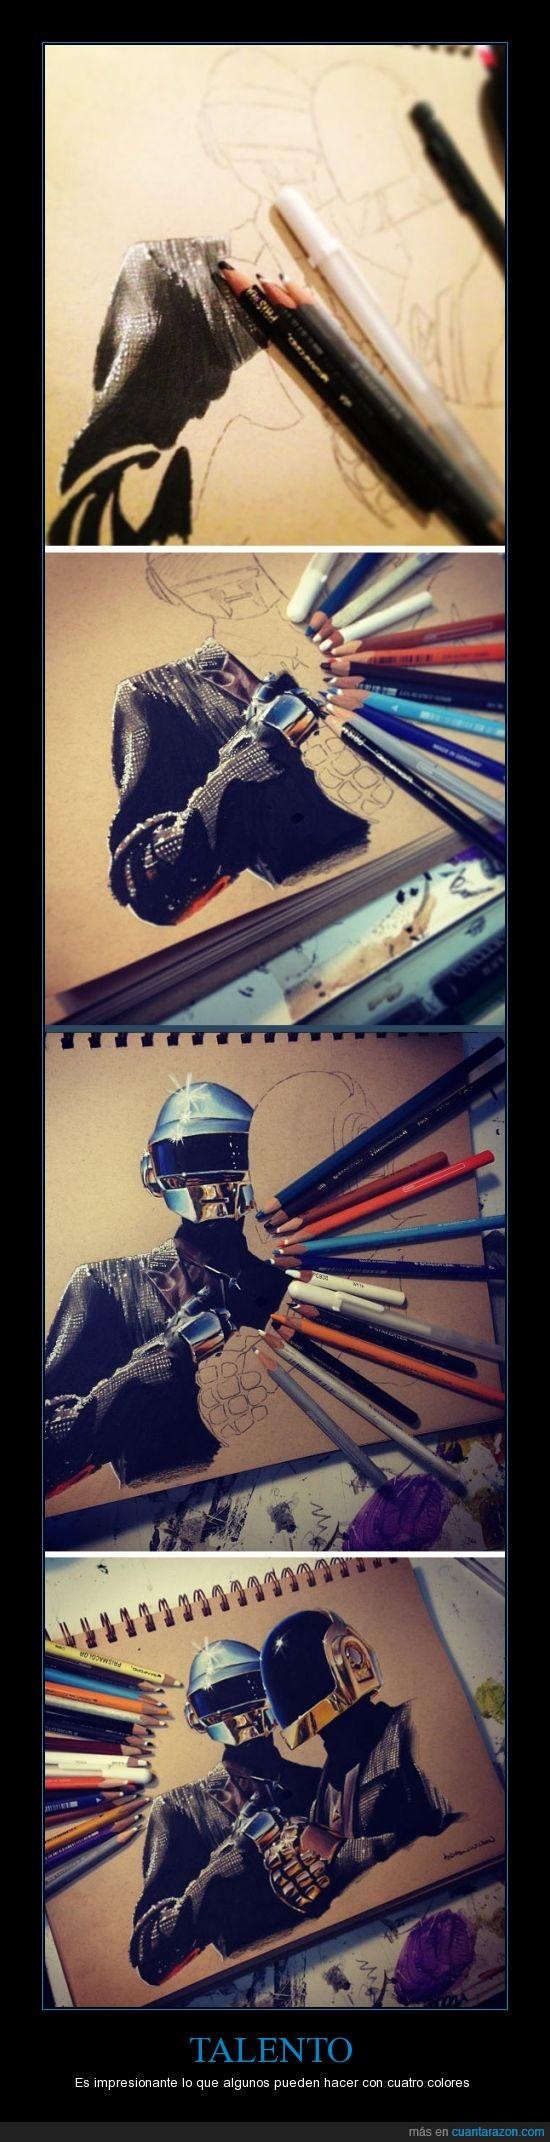 arte,daft punk,impresionante,lápices,molar